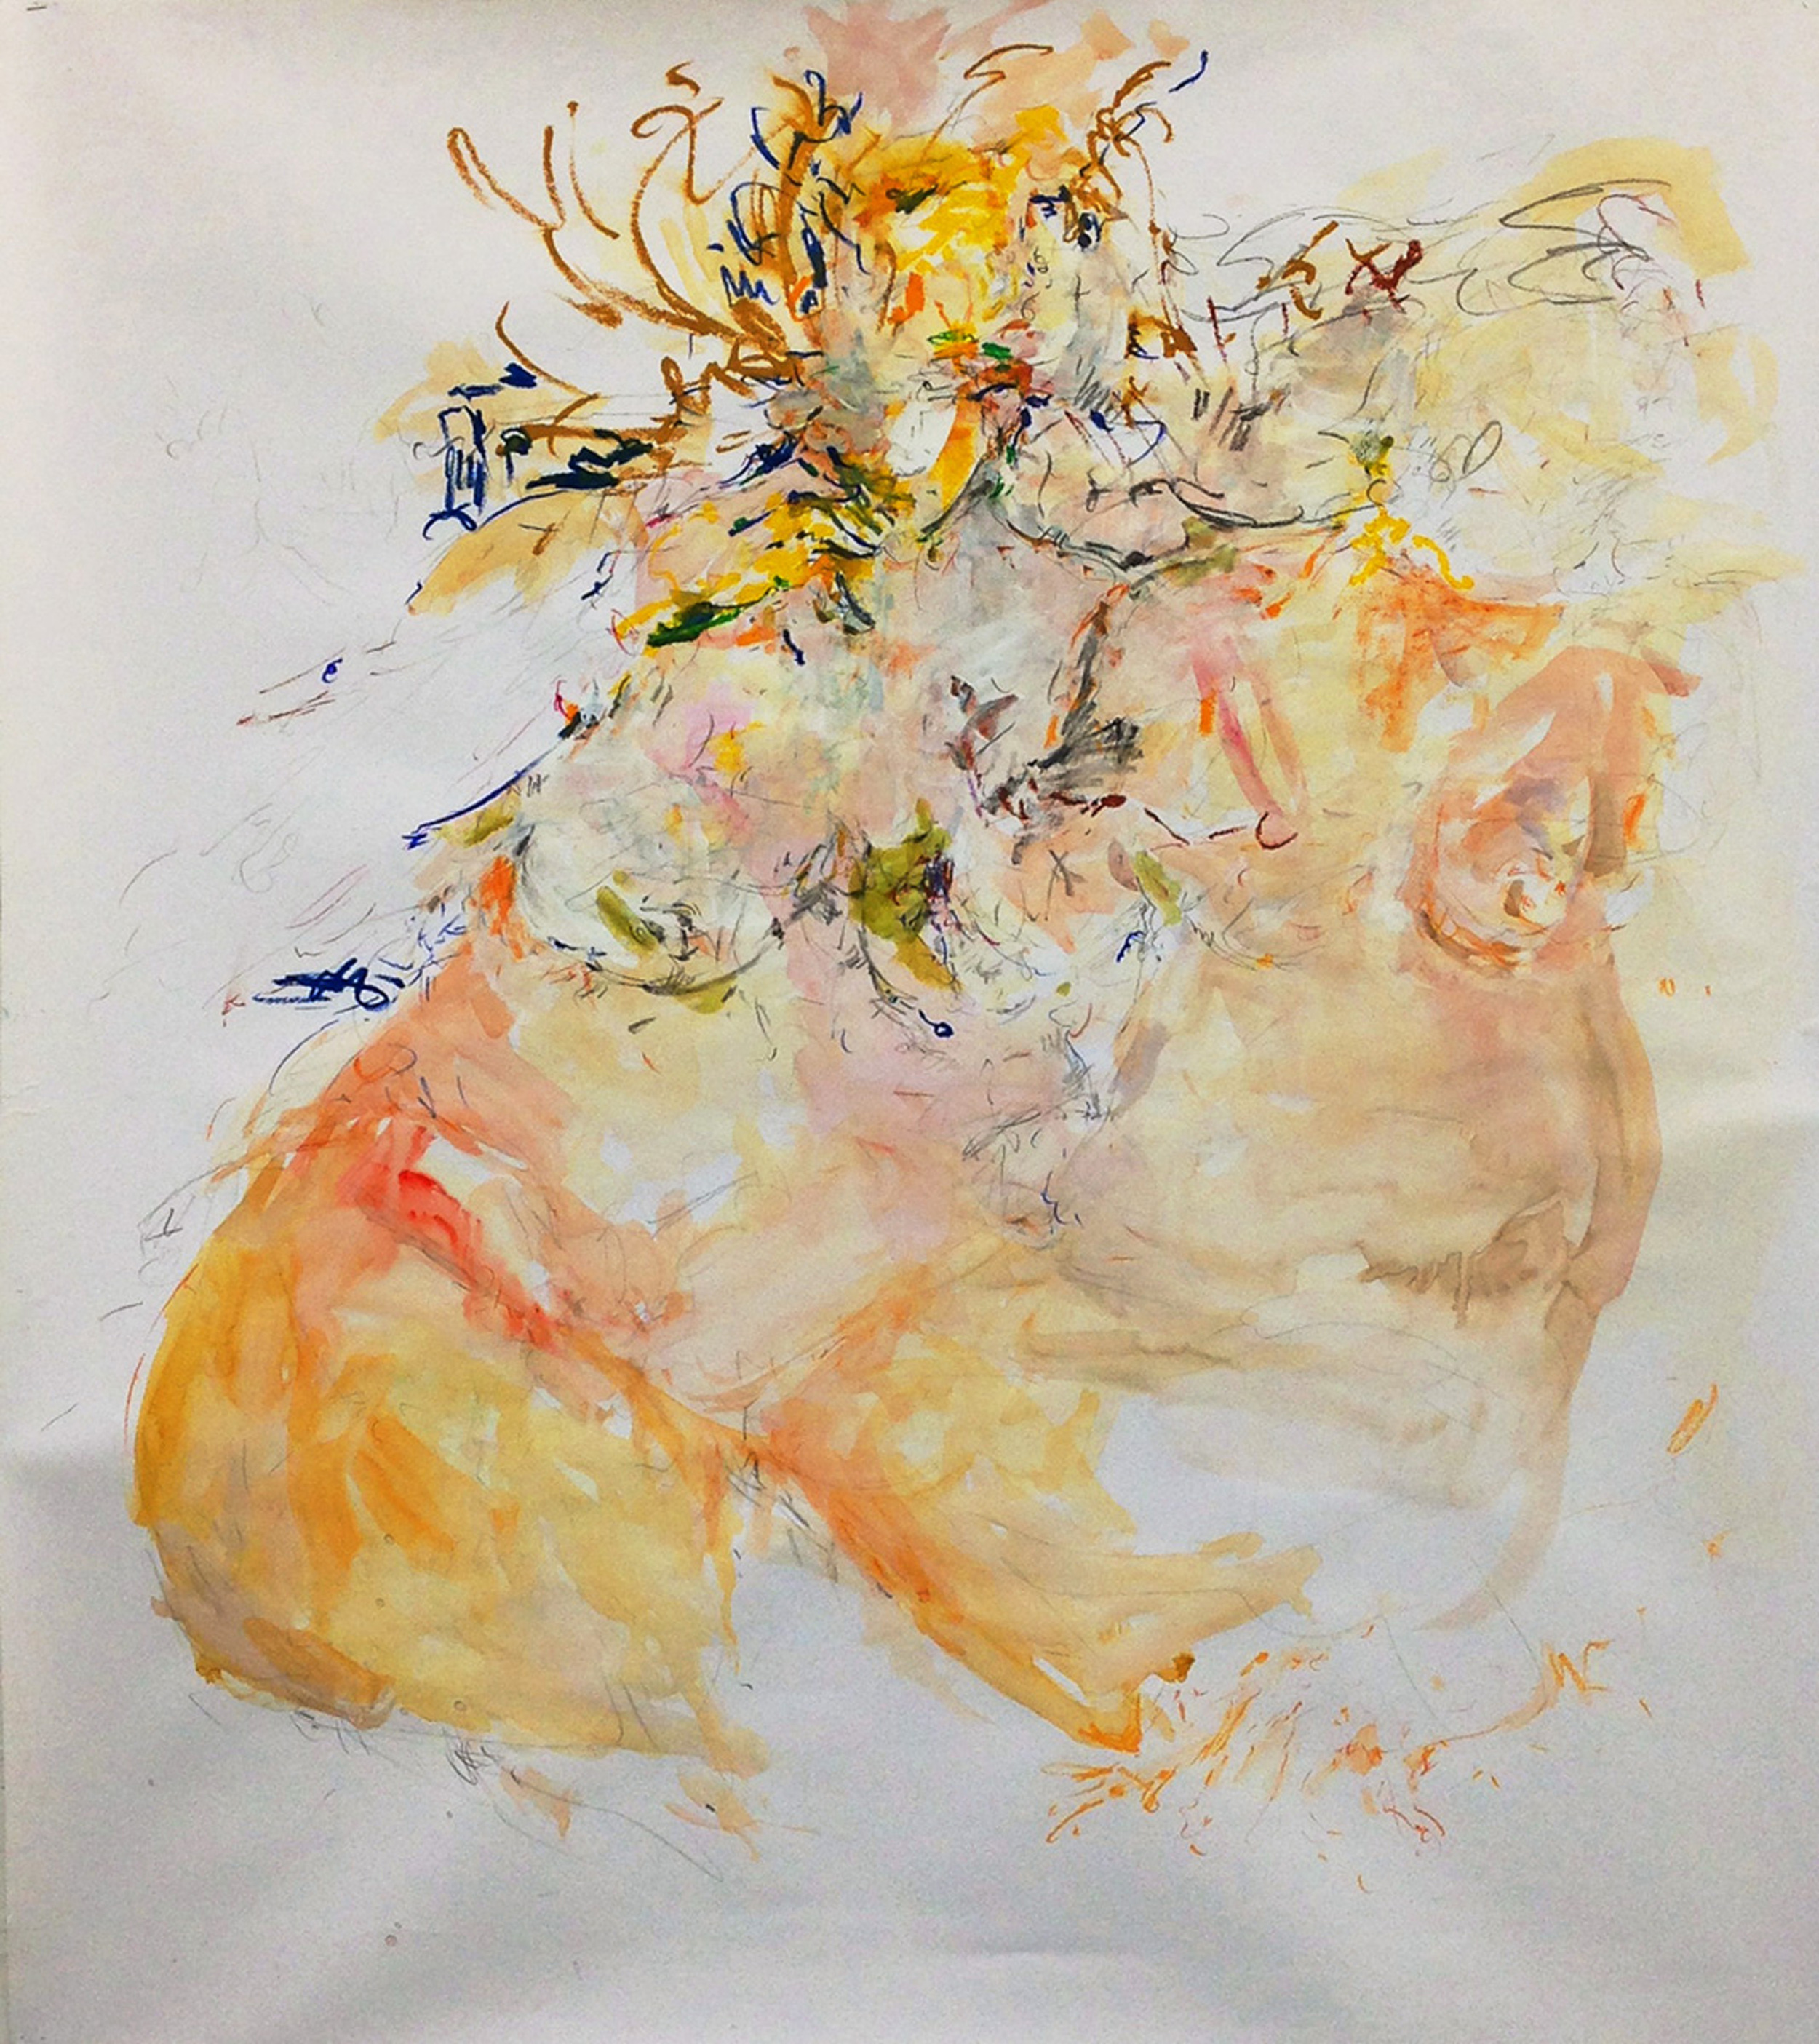 SARAH CREAGEN  And she knew all my secrets  ,  2013. Oilstick, graphite, watercolour, acrylic, chalk, conté, oil pastel, 48 x 41.5 inches.